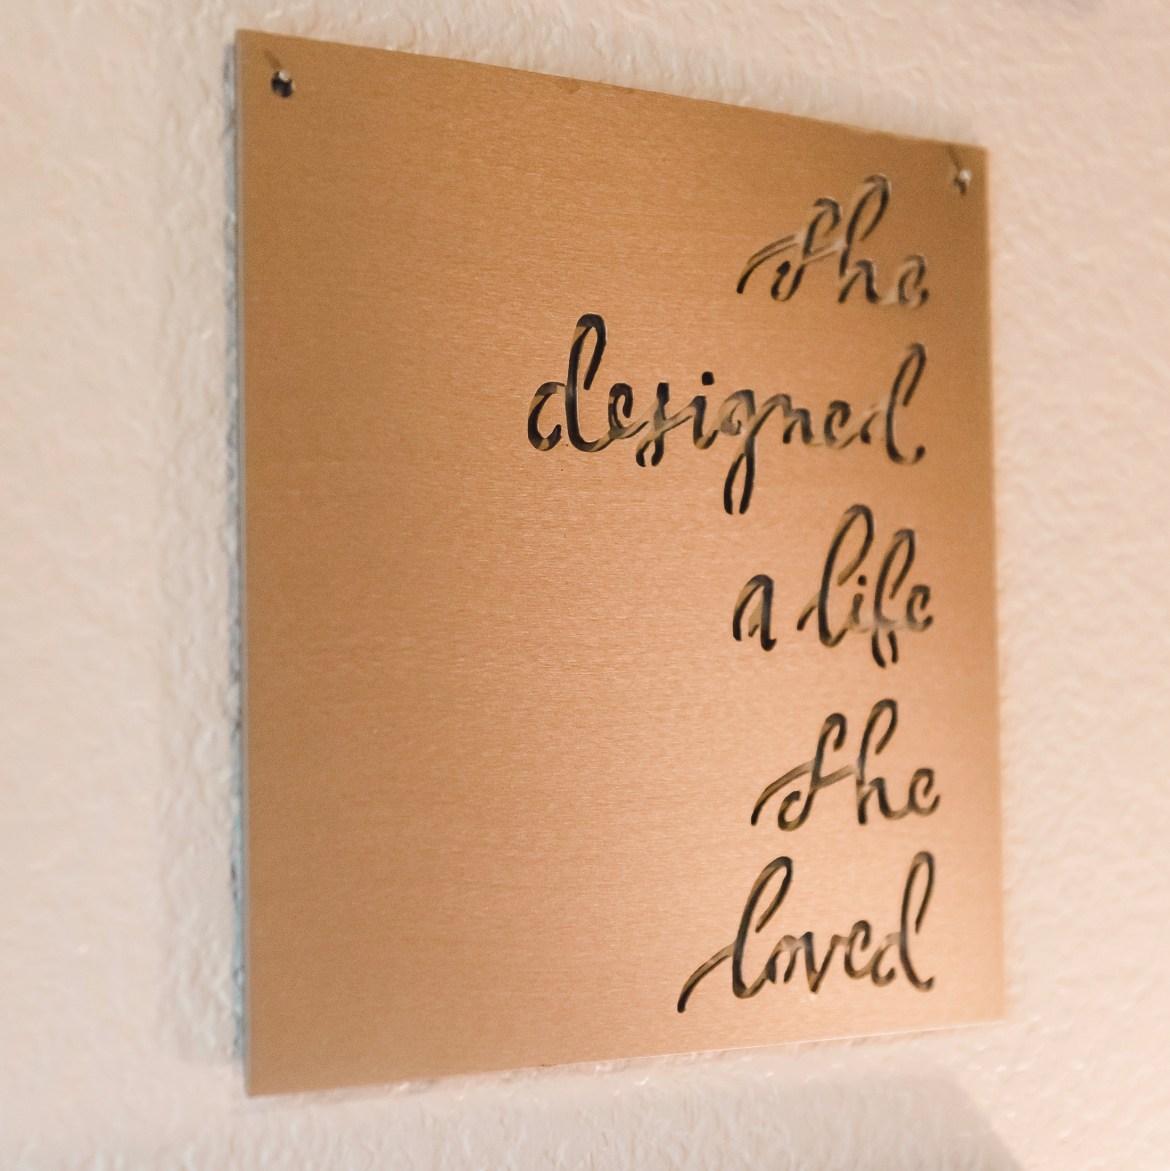 She designed a life she loved metal sign. #magnolia #magnoliamarket #waco